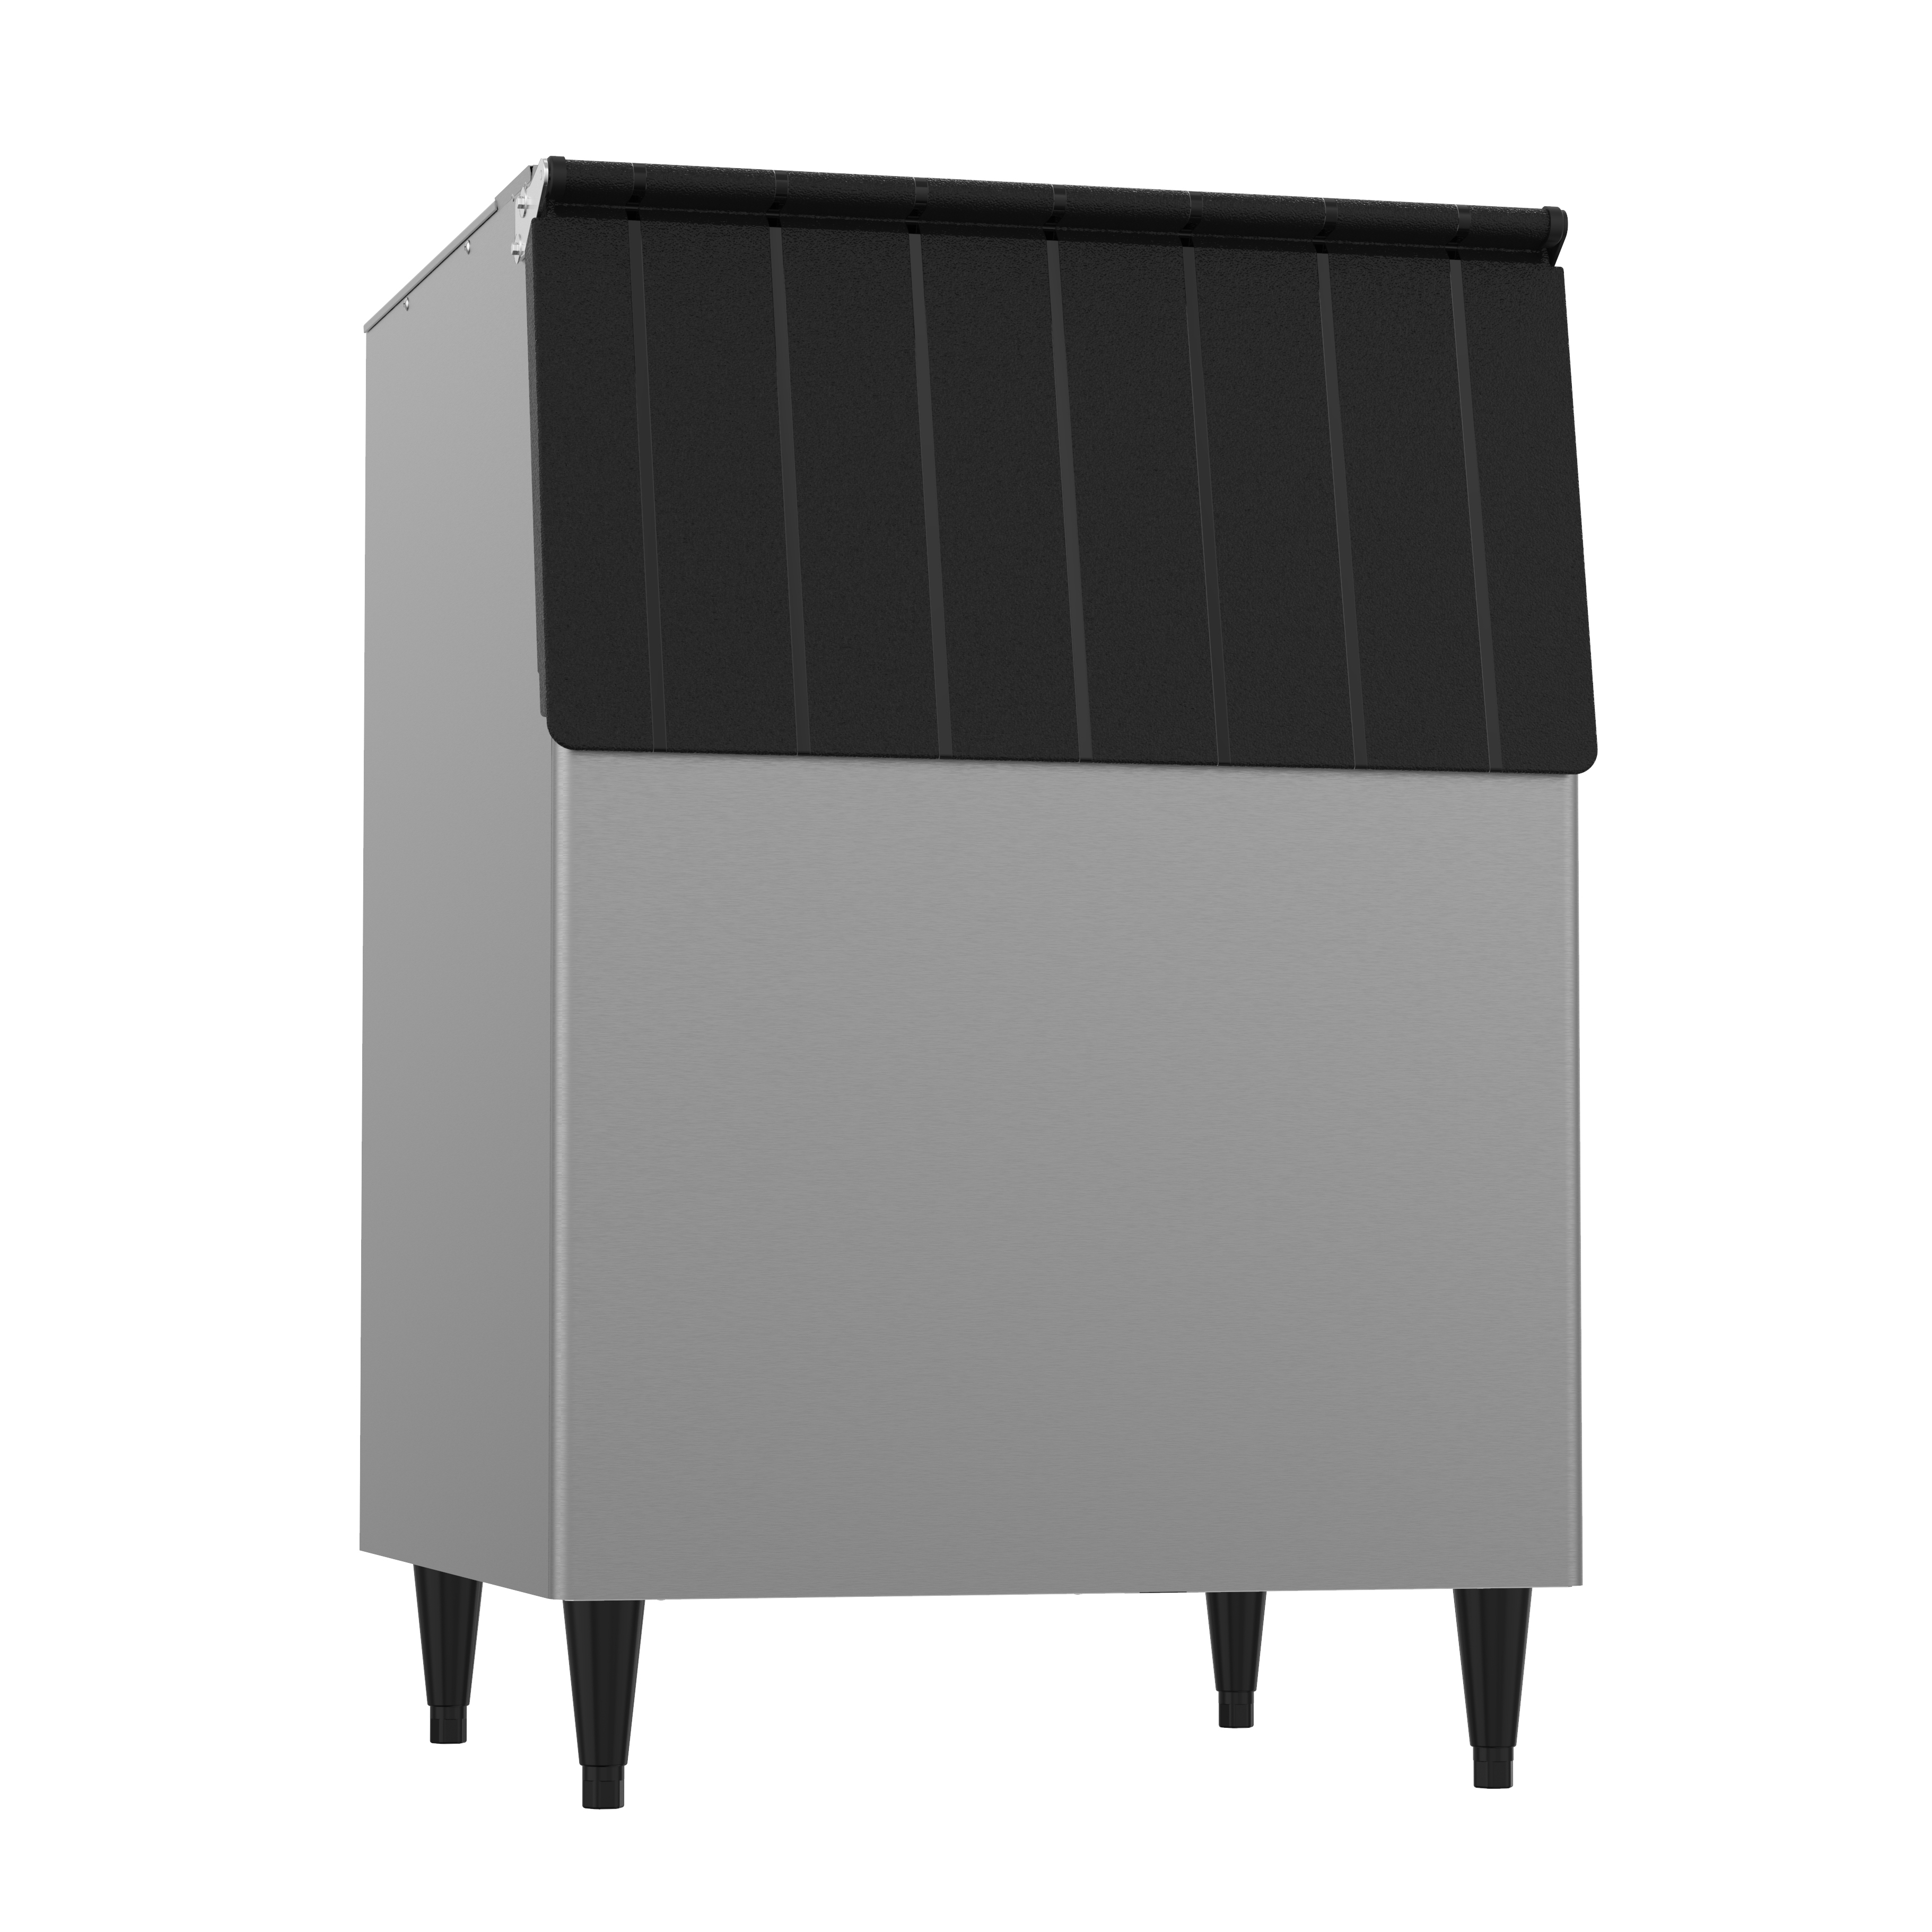 Hoshizaki B-500PF ice cubers, ice storage & ice dispensers